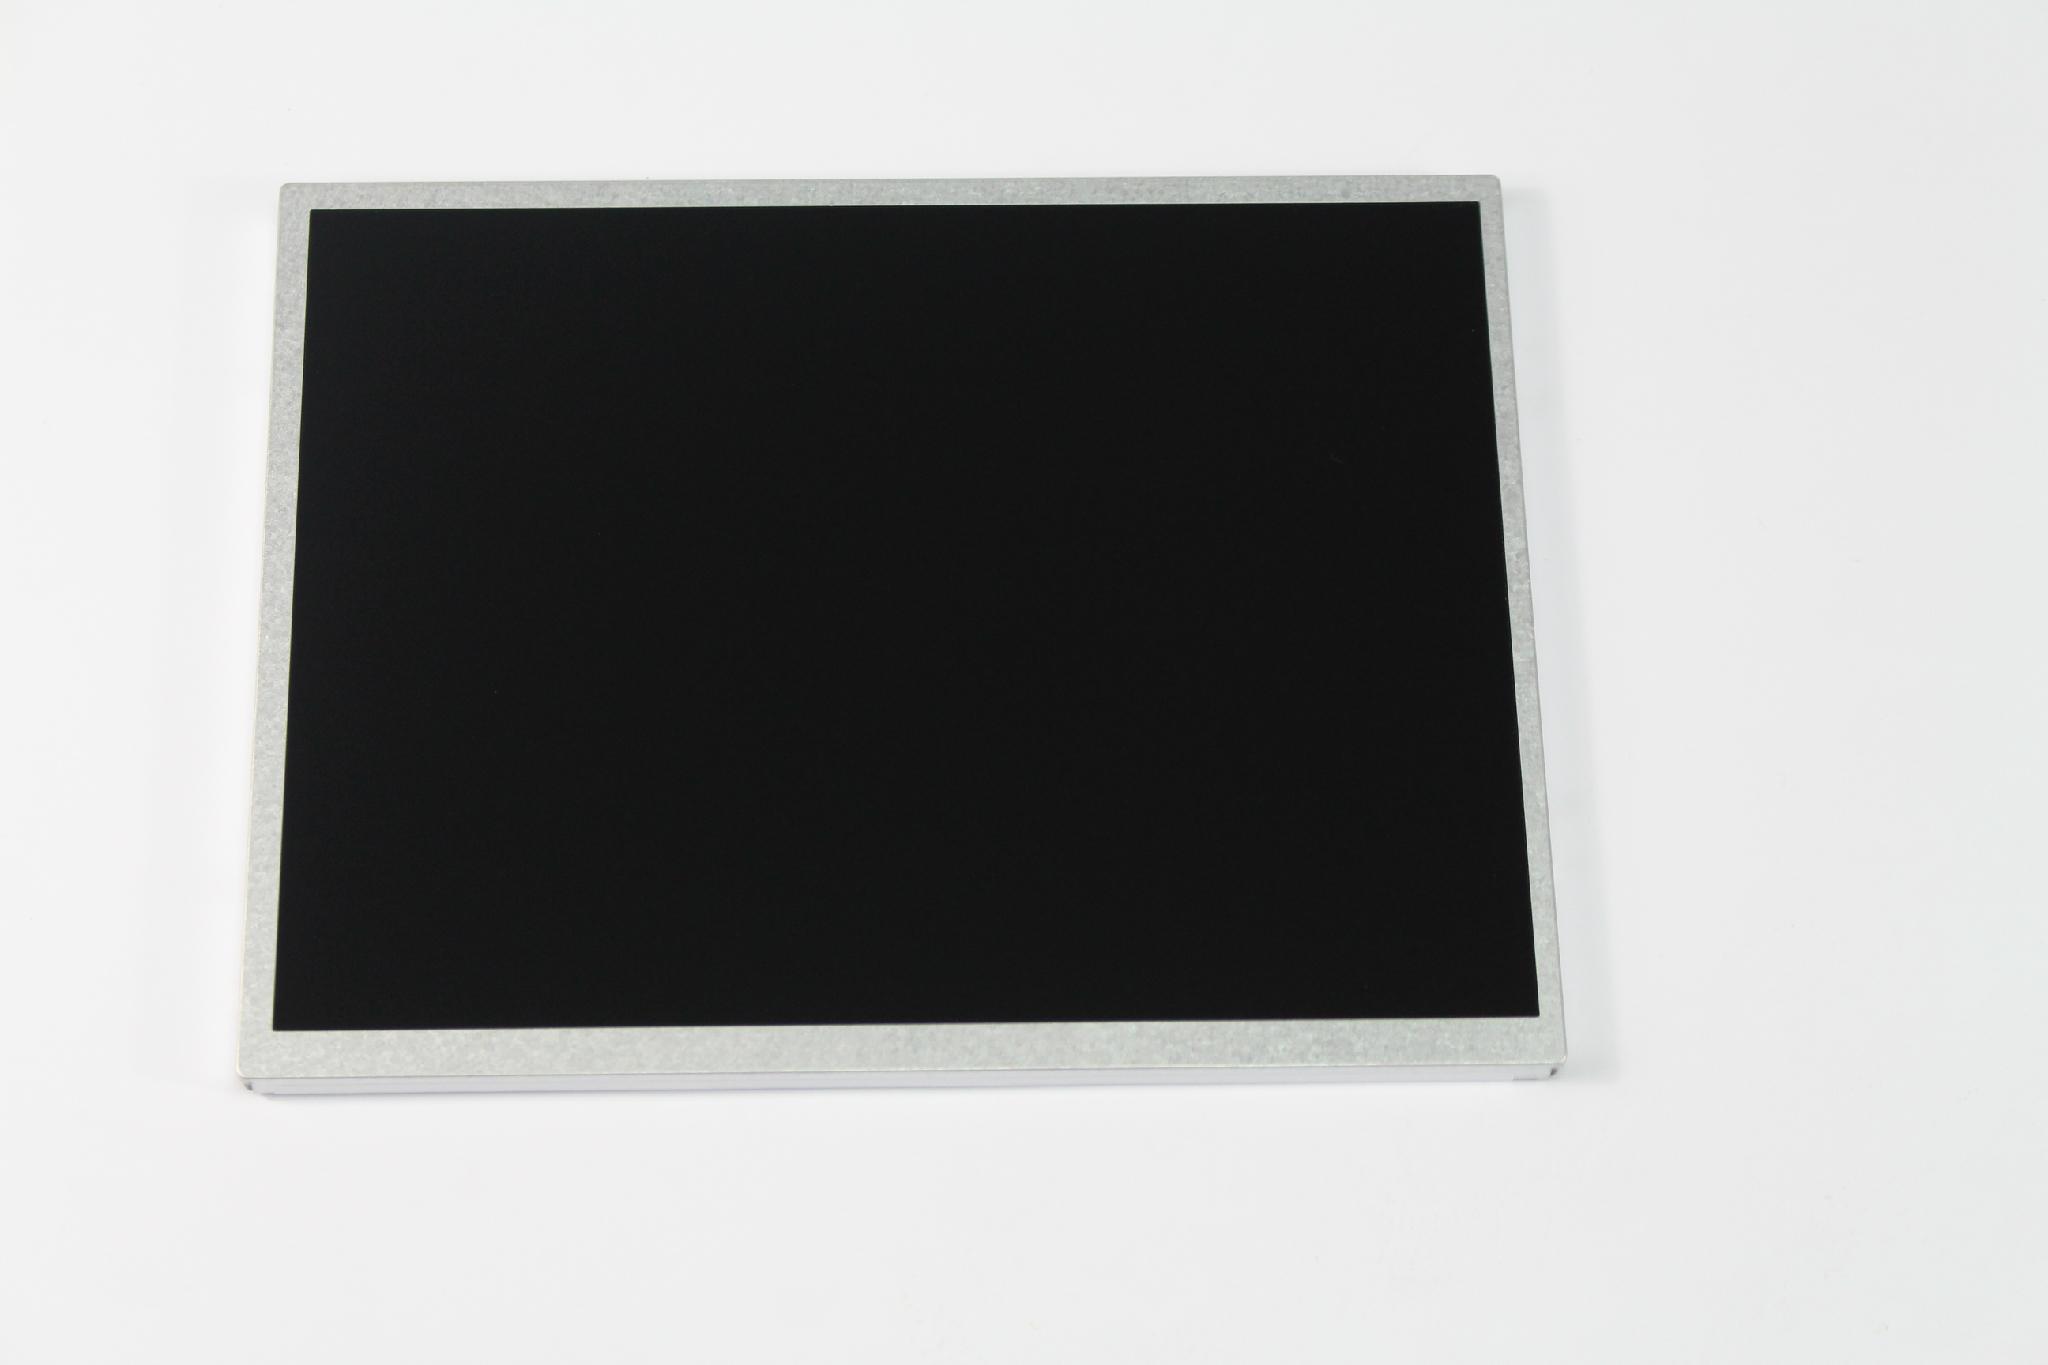 N101ICG HDMI+VGA +AV LCD board +cables+Inverter +Remote control +OSD keypad +10. 5